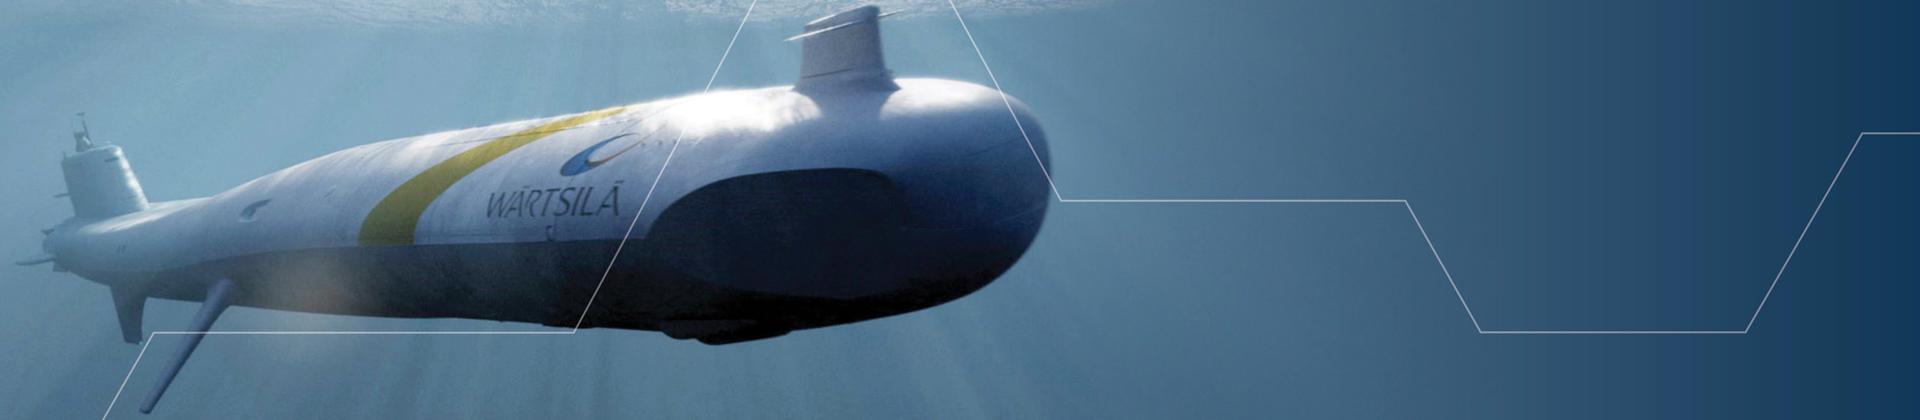 Submarine_1920-x-420_no-text-v3